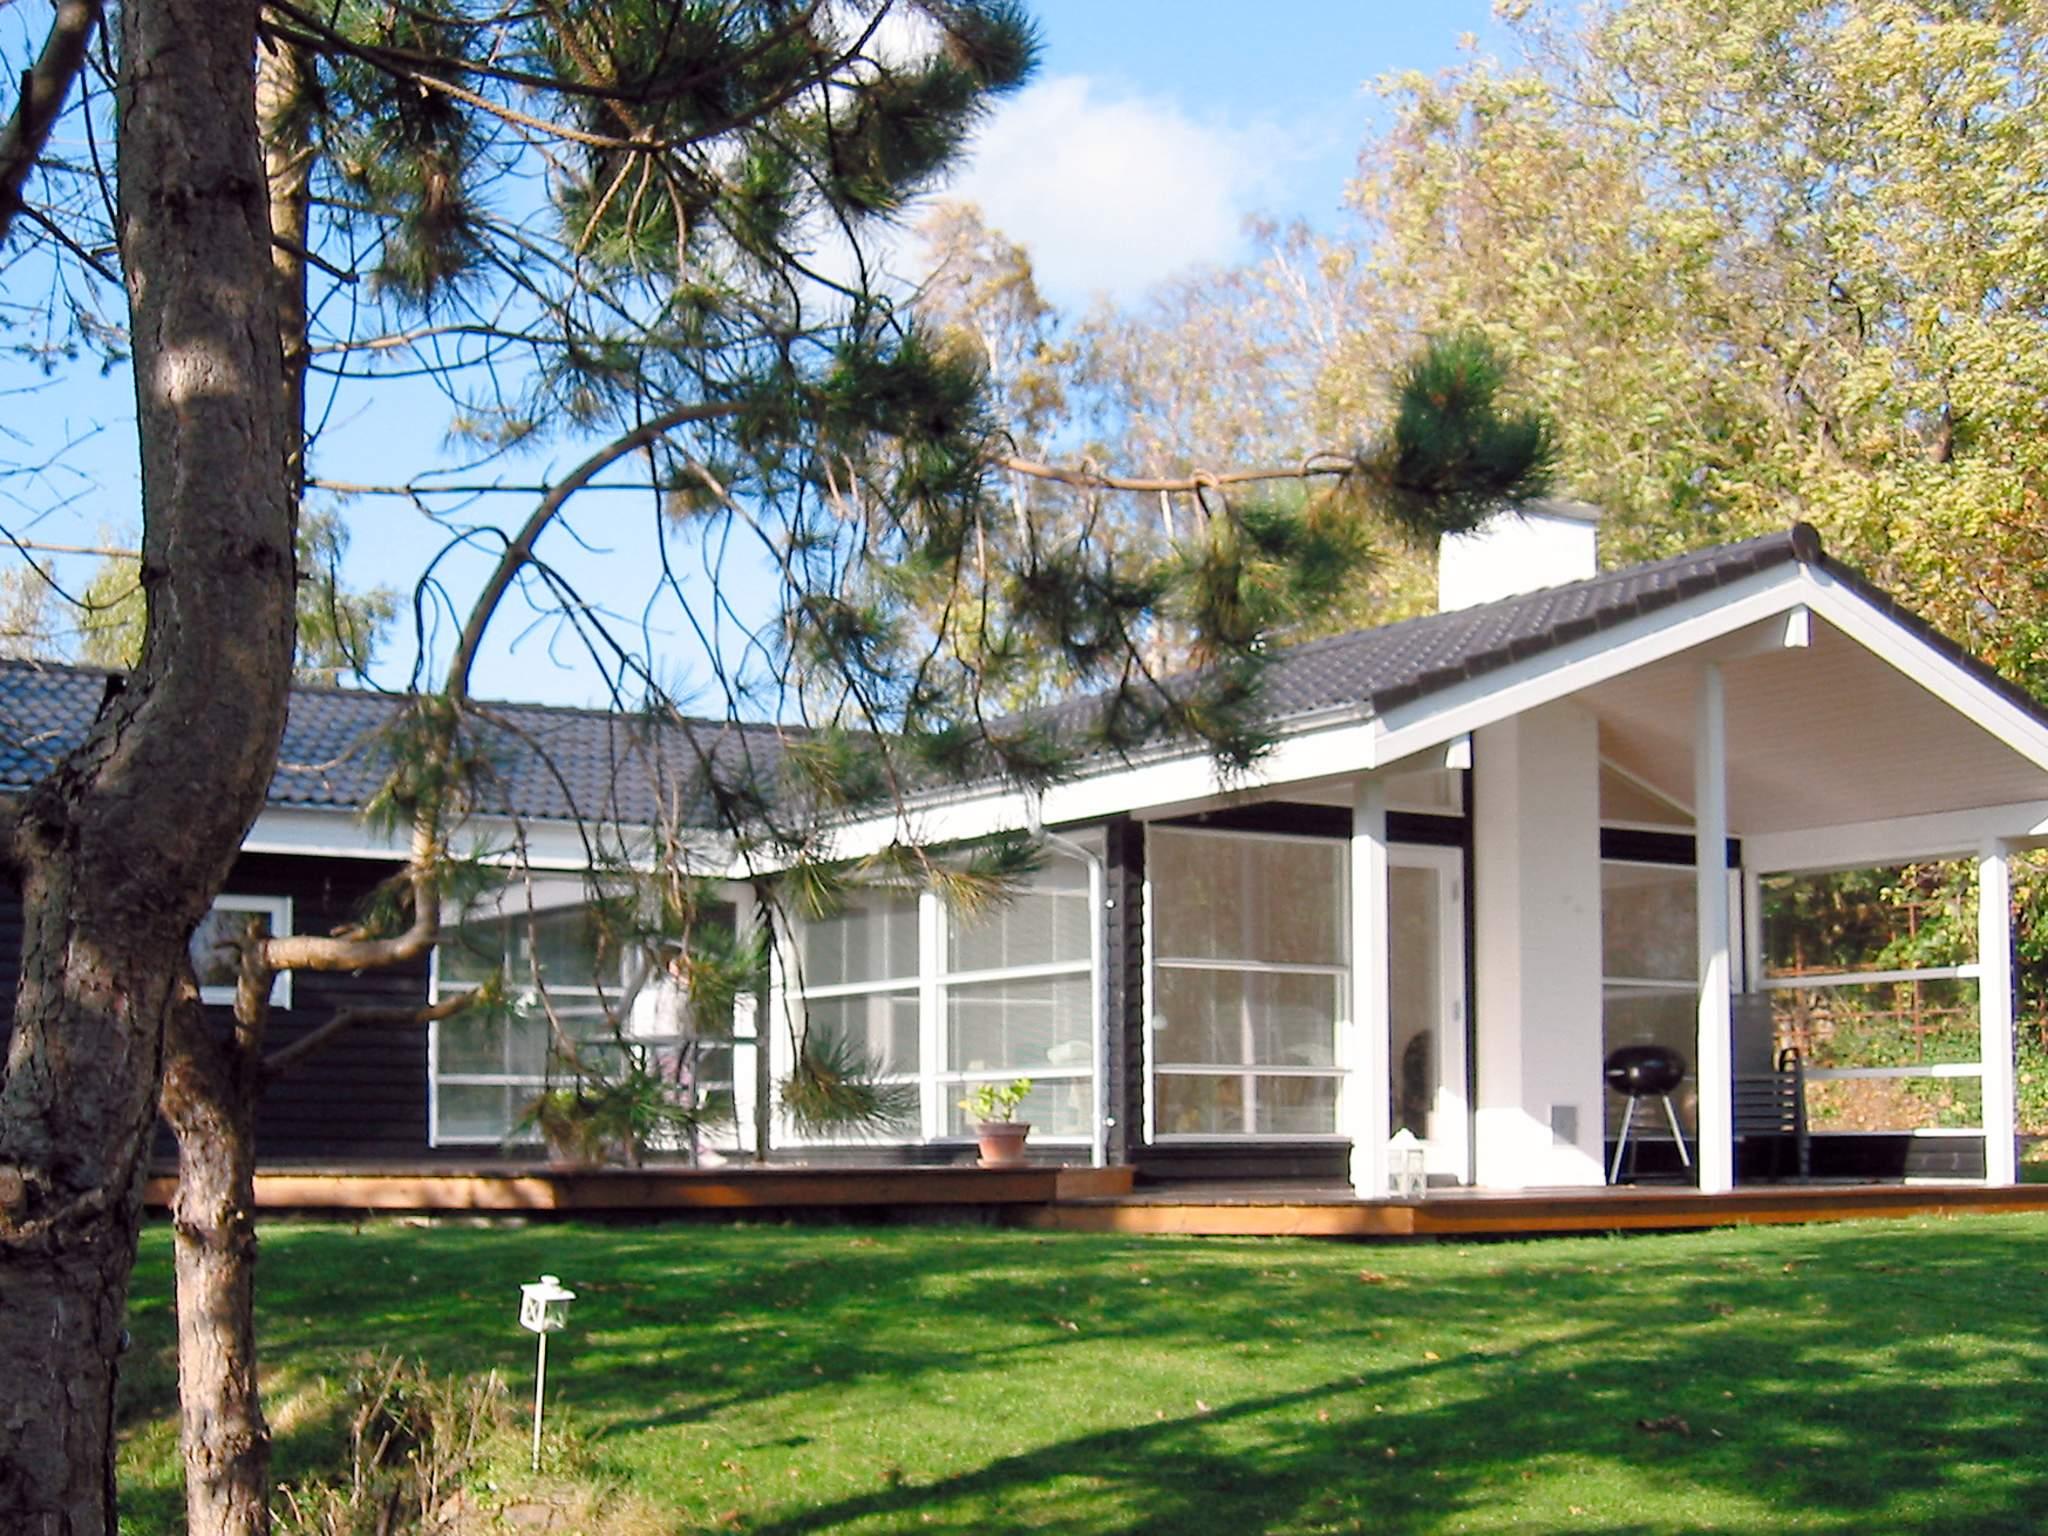 Maison de vacances Skibby (124927), Kirke Hyllinge, , Seeland Nord, Danemark, image 20